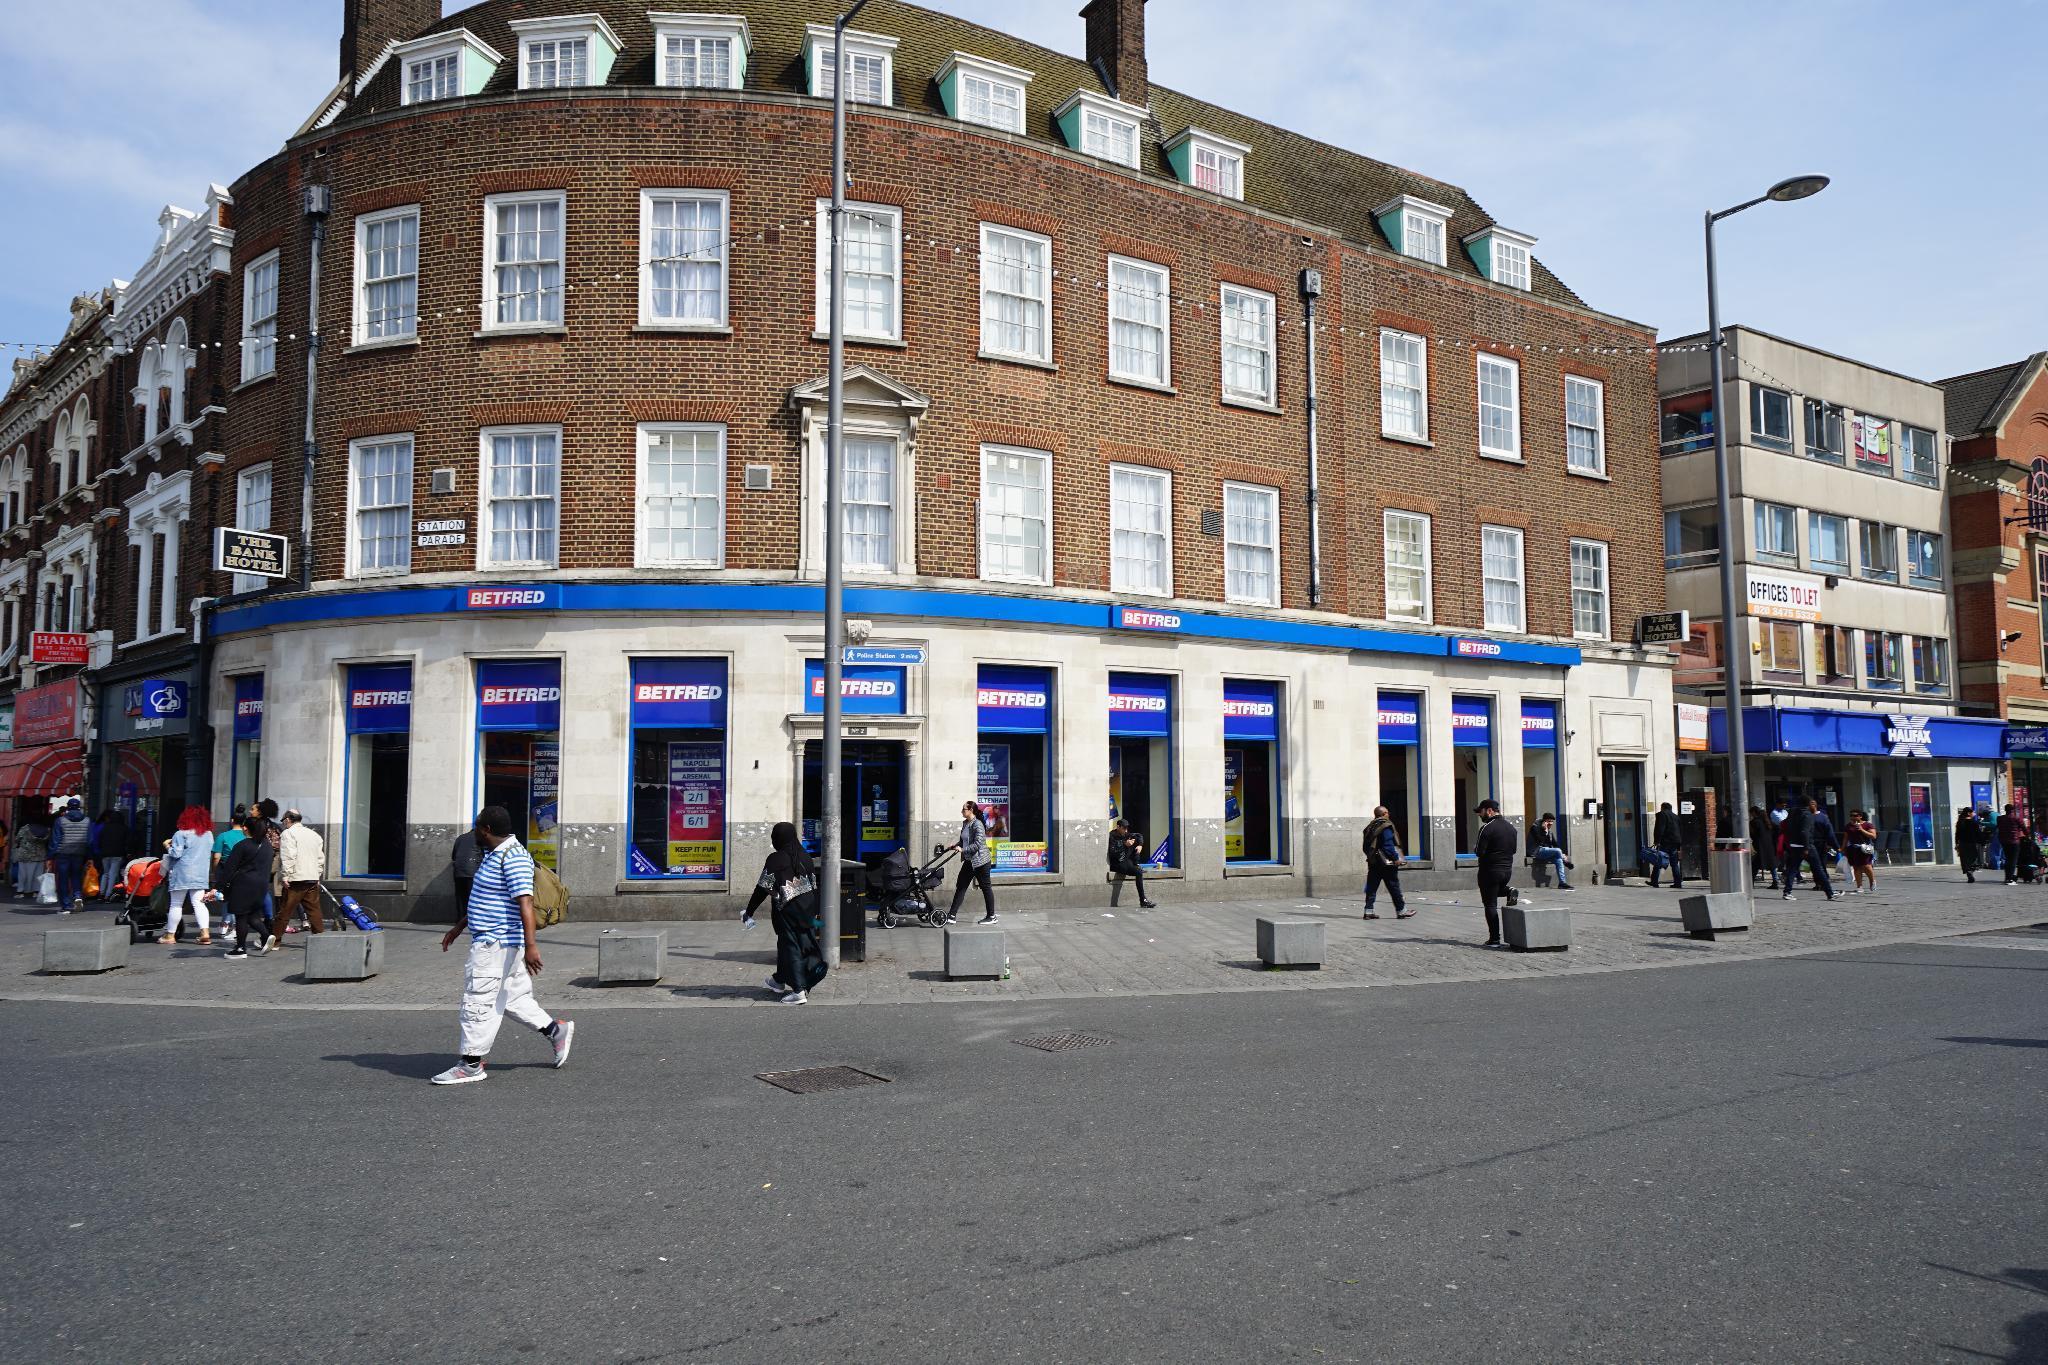 Bank Hotel London